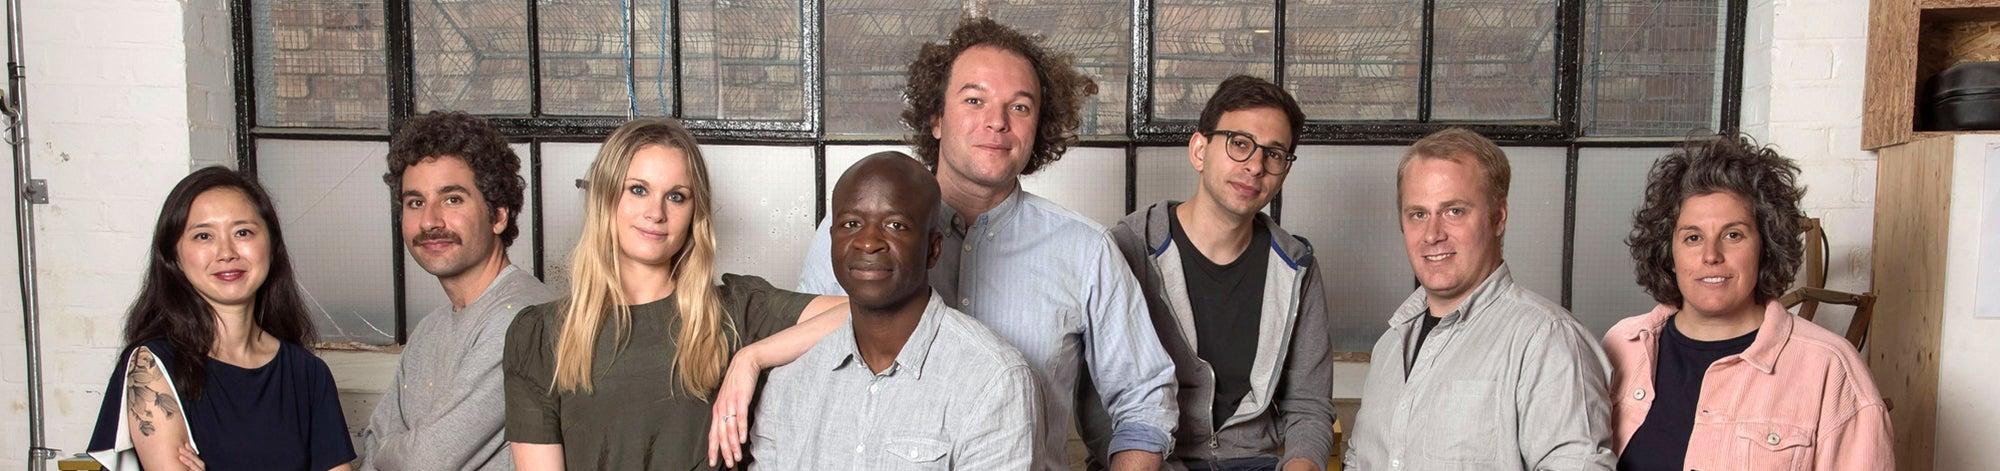 The Big Life Fix crew, BBC Series